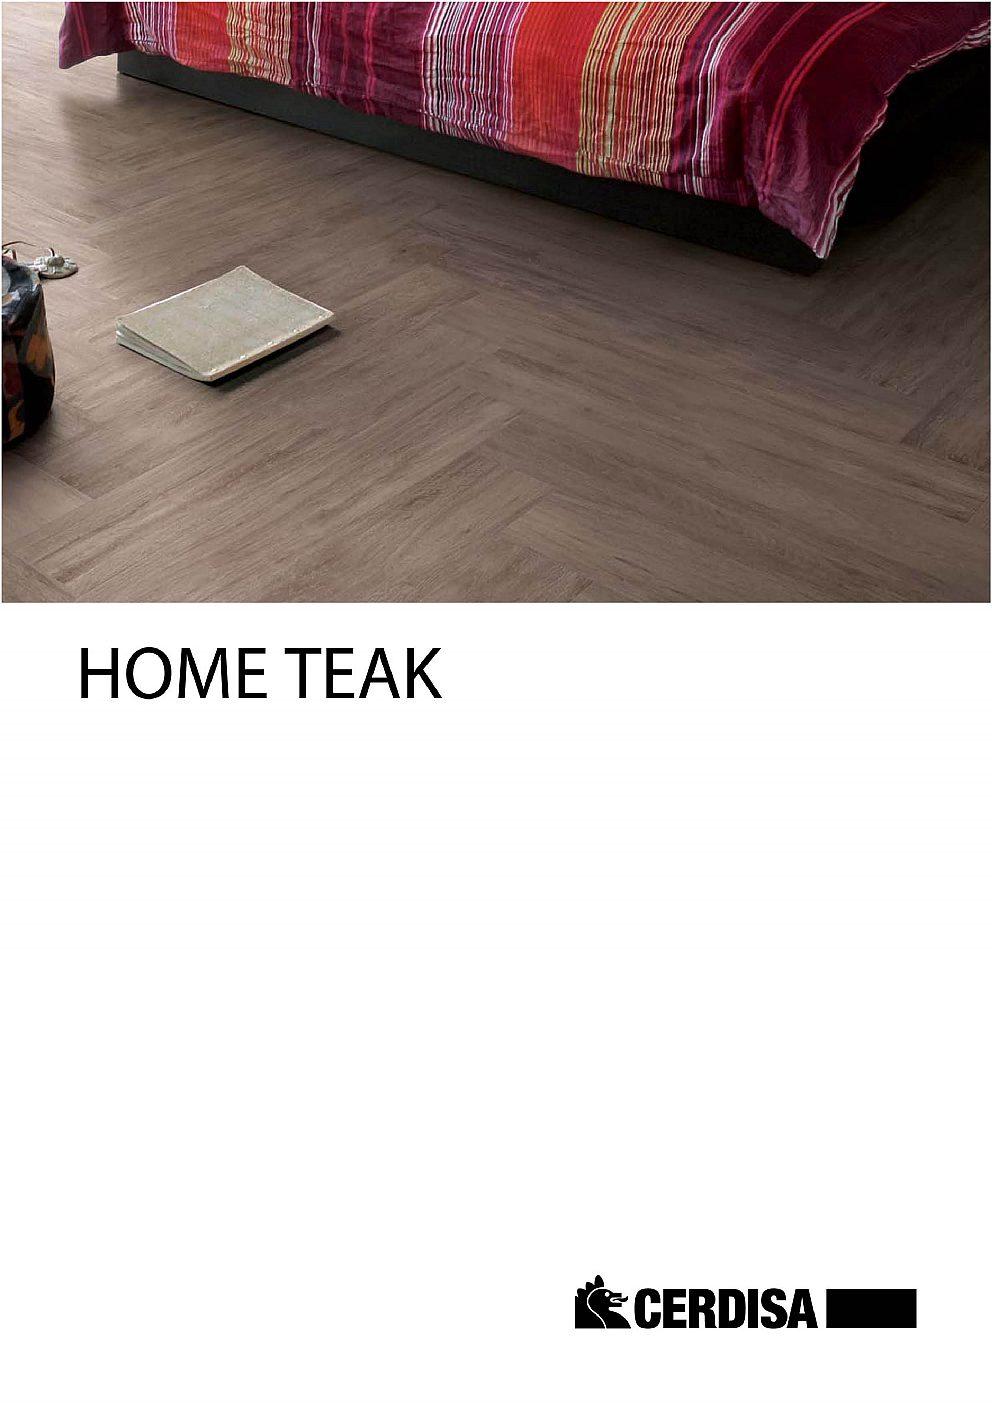 Cerdisa - Home Teak